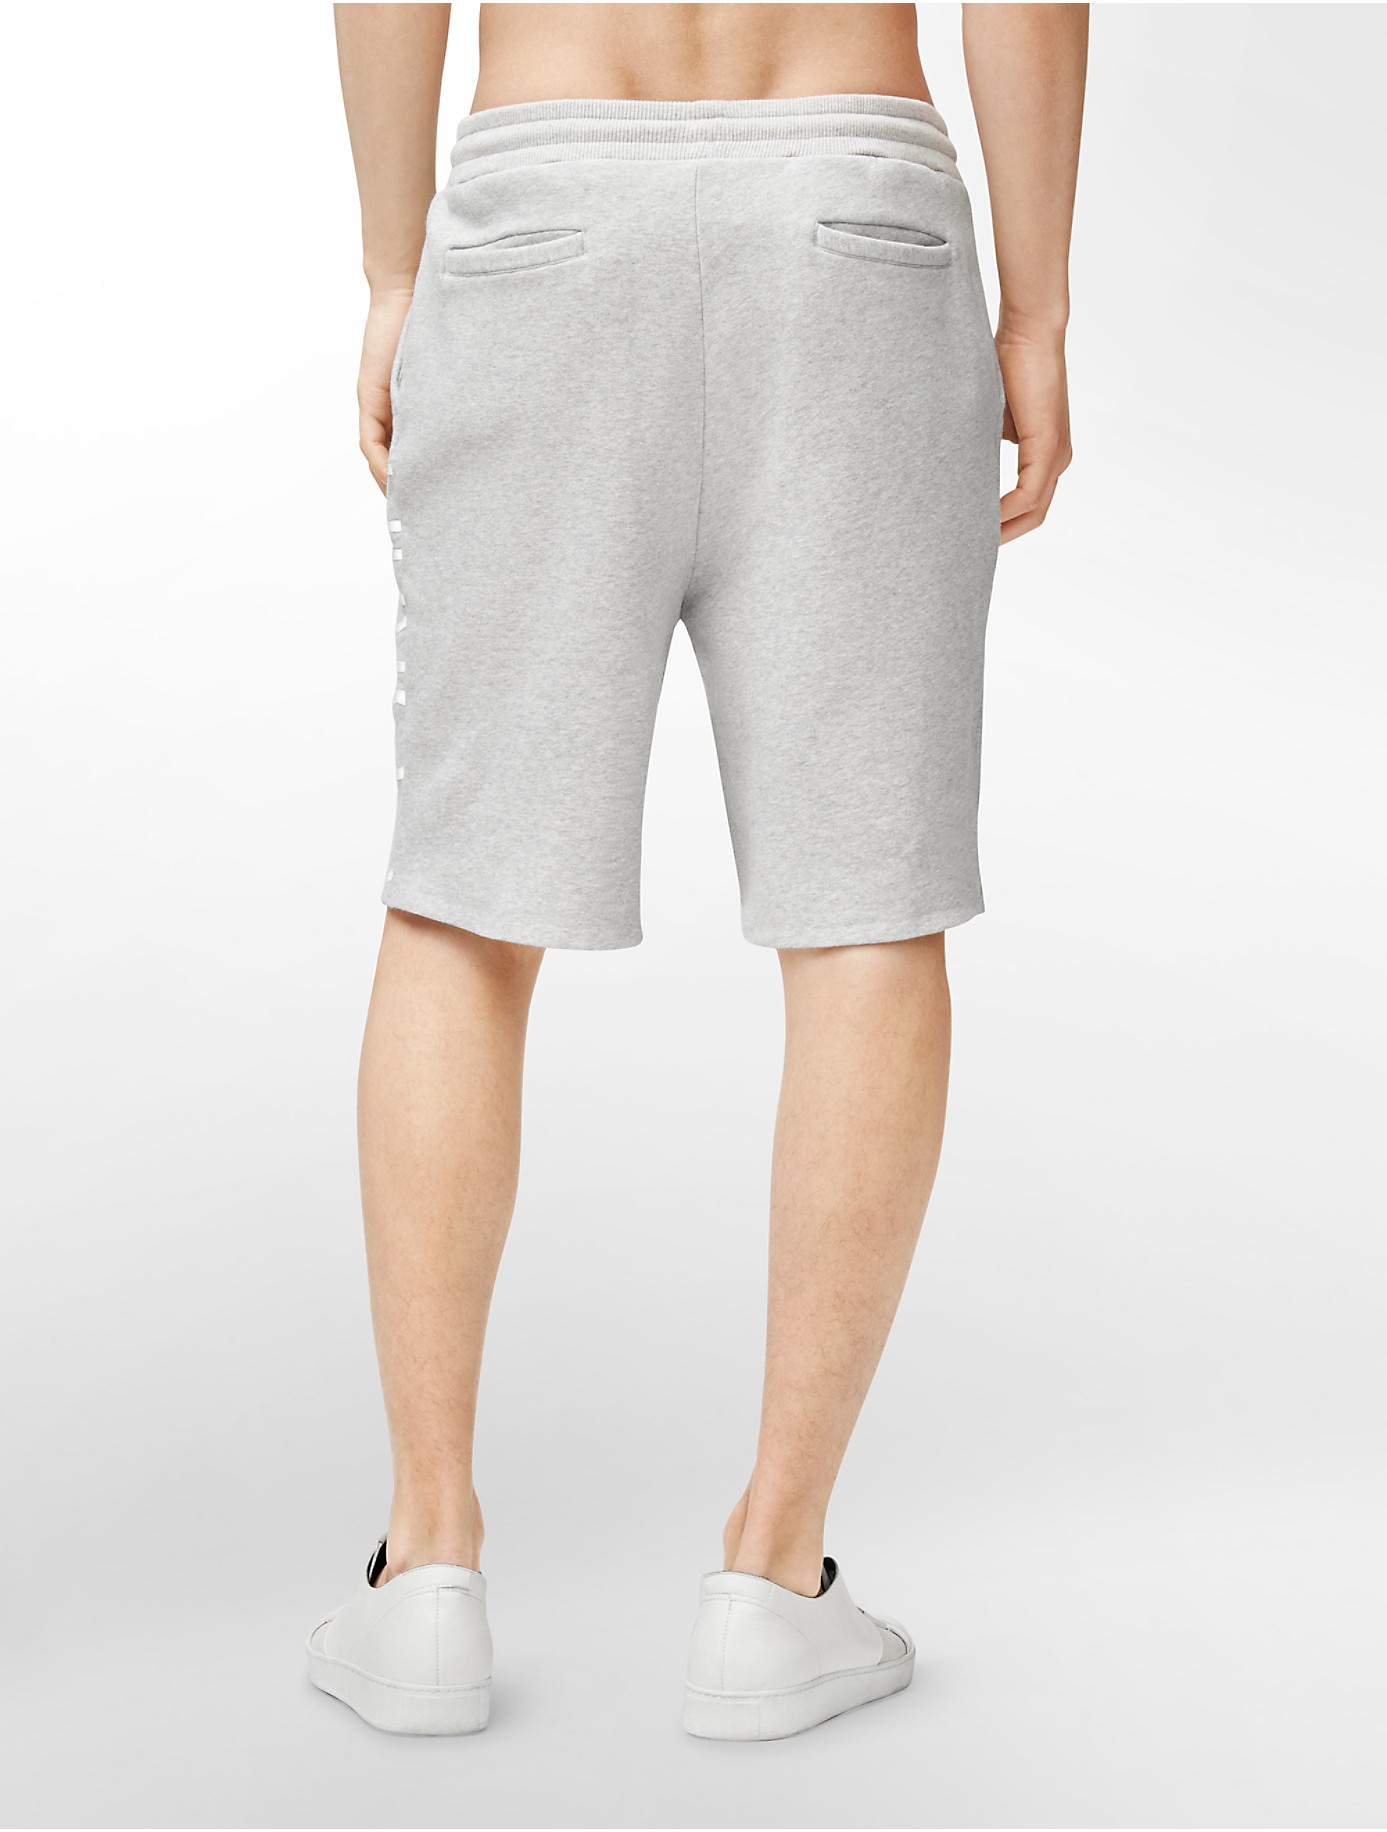 Logo Sweatshort Jogger Calvin For In Men Klein Lyst Gray Jeans Uw1qOHv